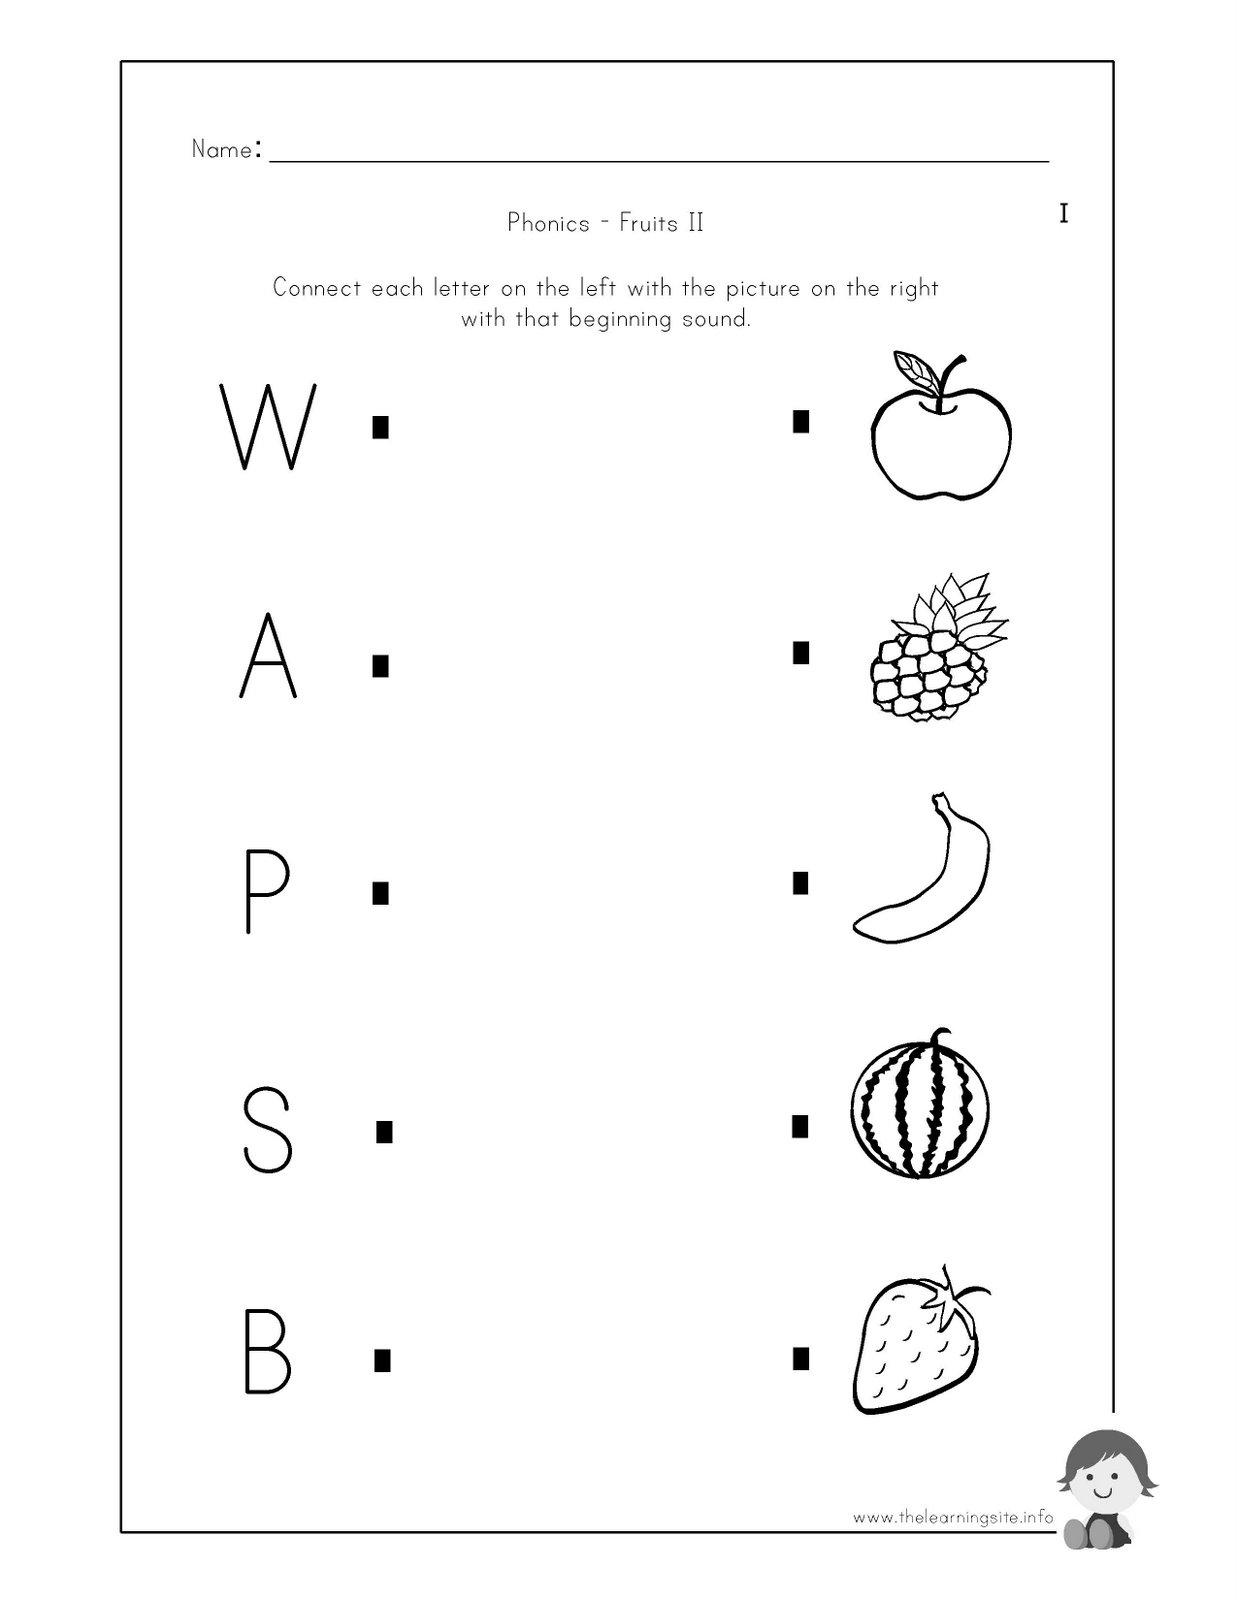 9Th Grade Vocabulary Worksheets – 9th Grade Vocabulary Worksheets